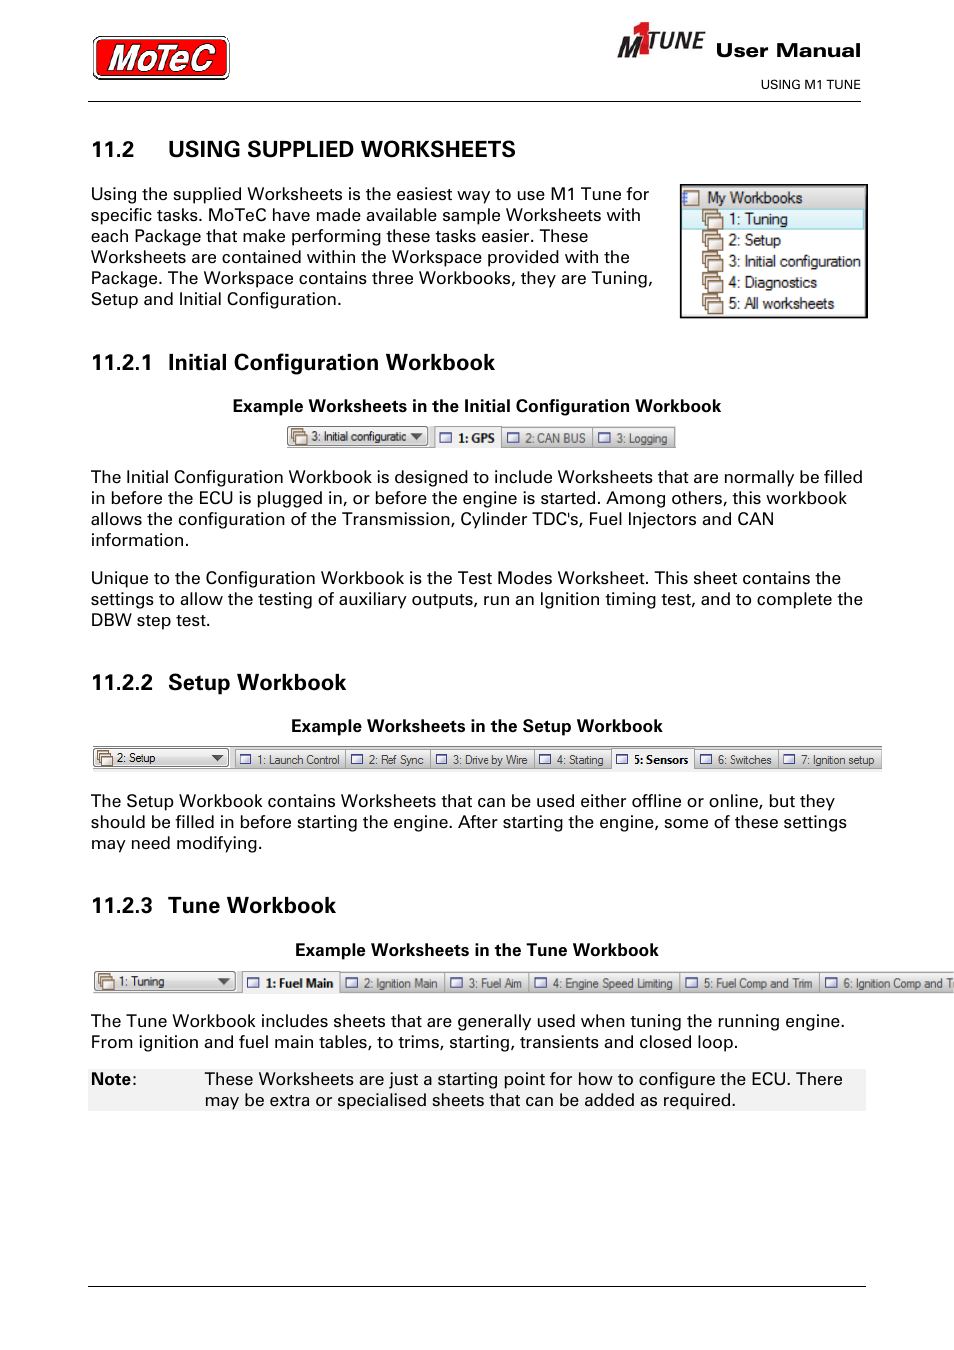 worksheet M1 Worksheets 2 using supplied worksheets 1 initial configuration workbook setup 3 tune